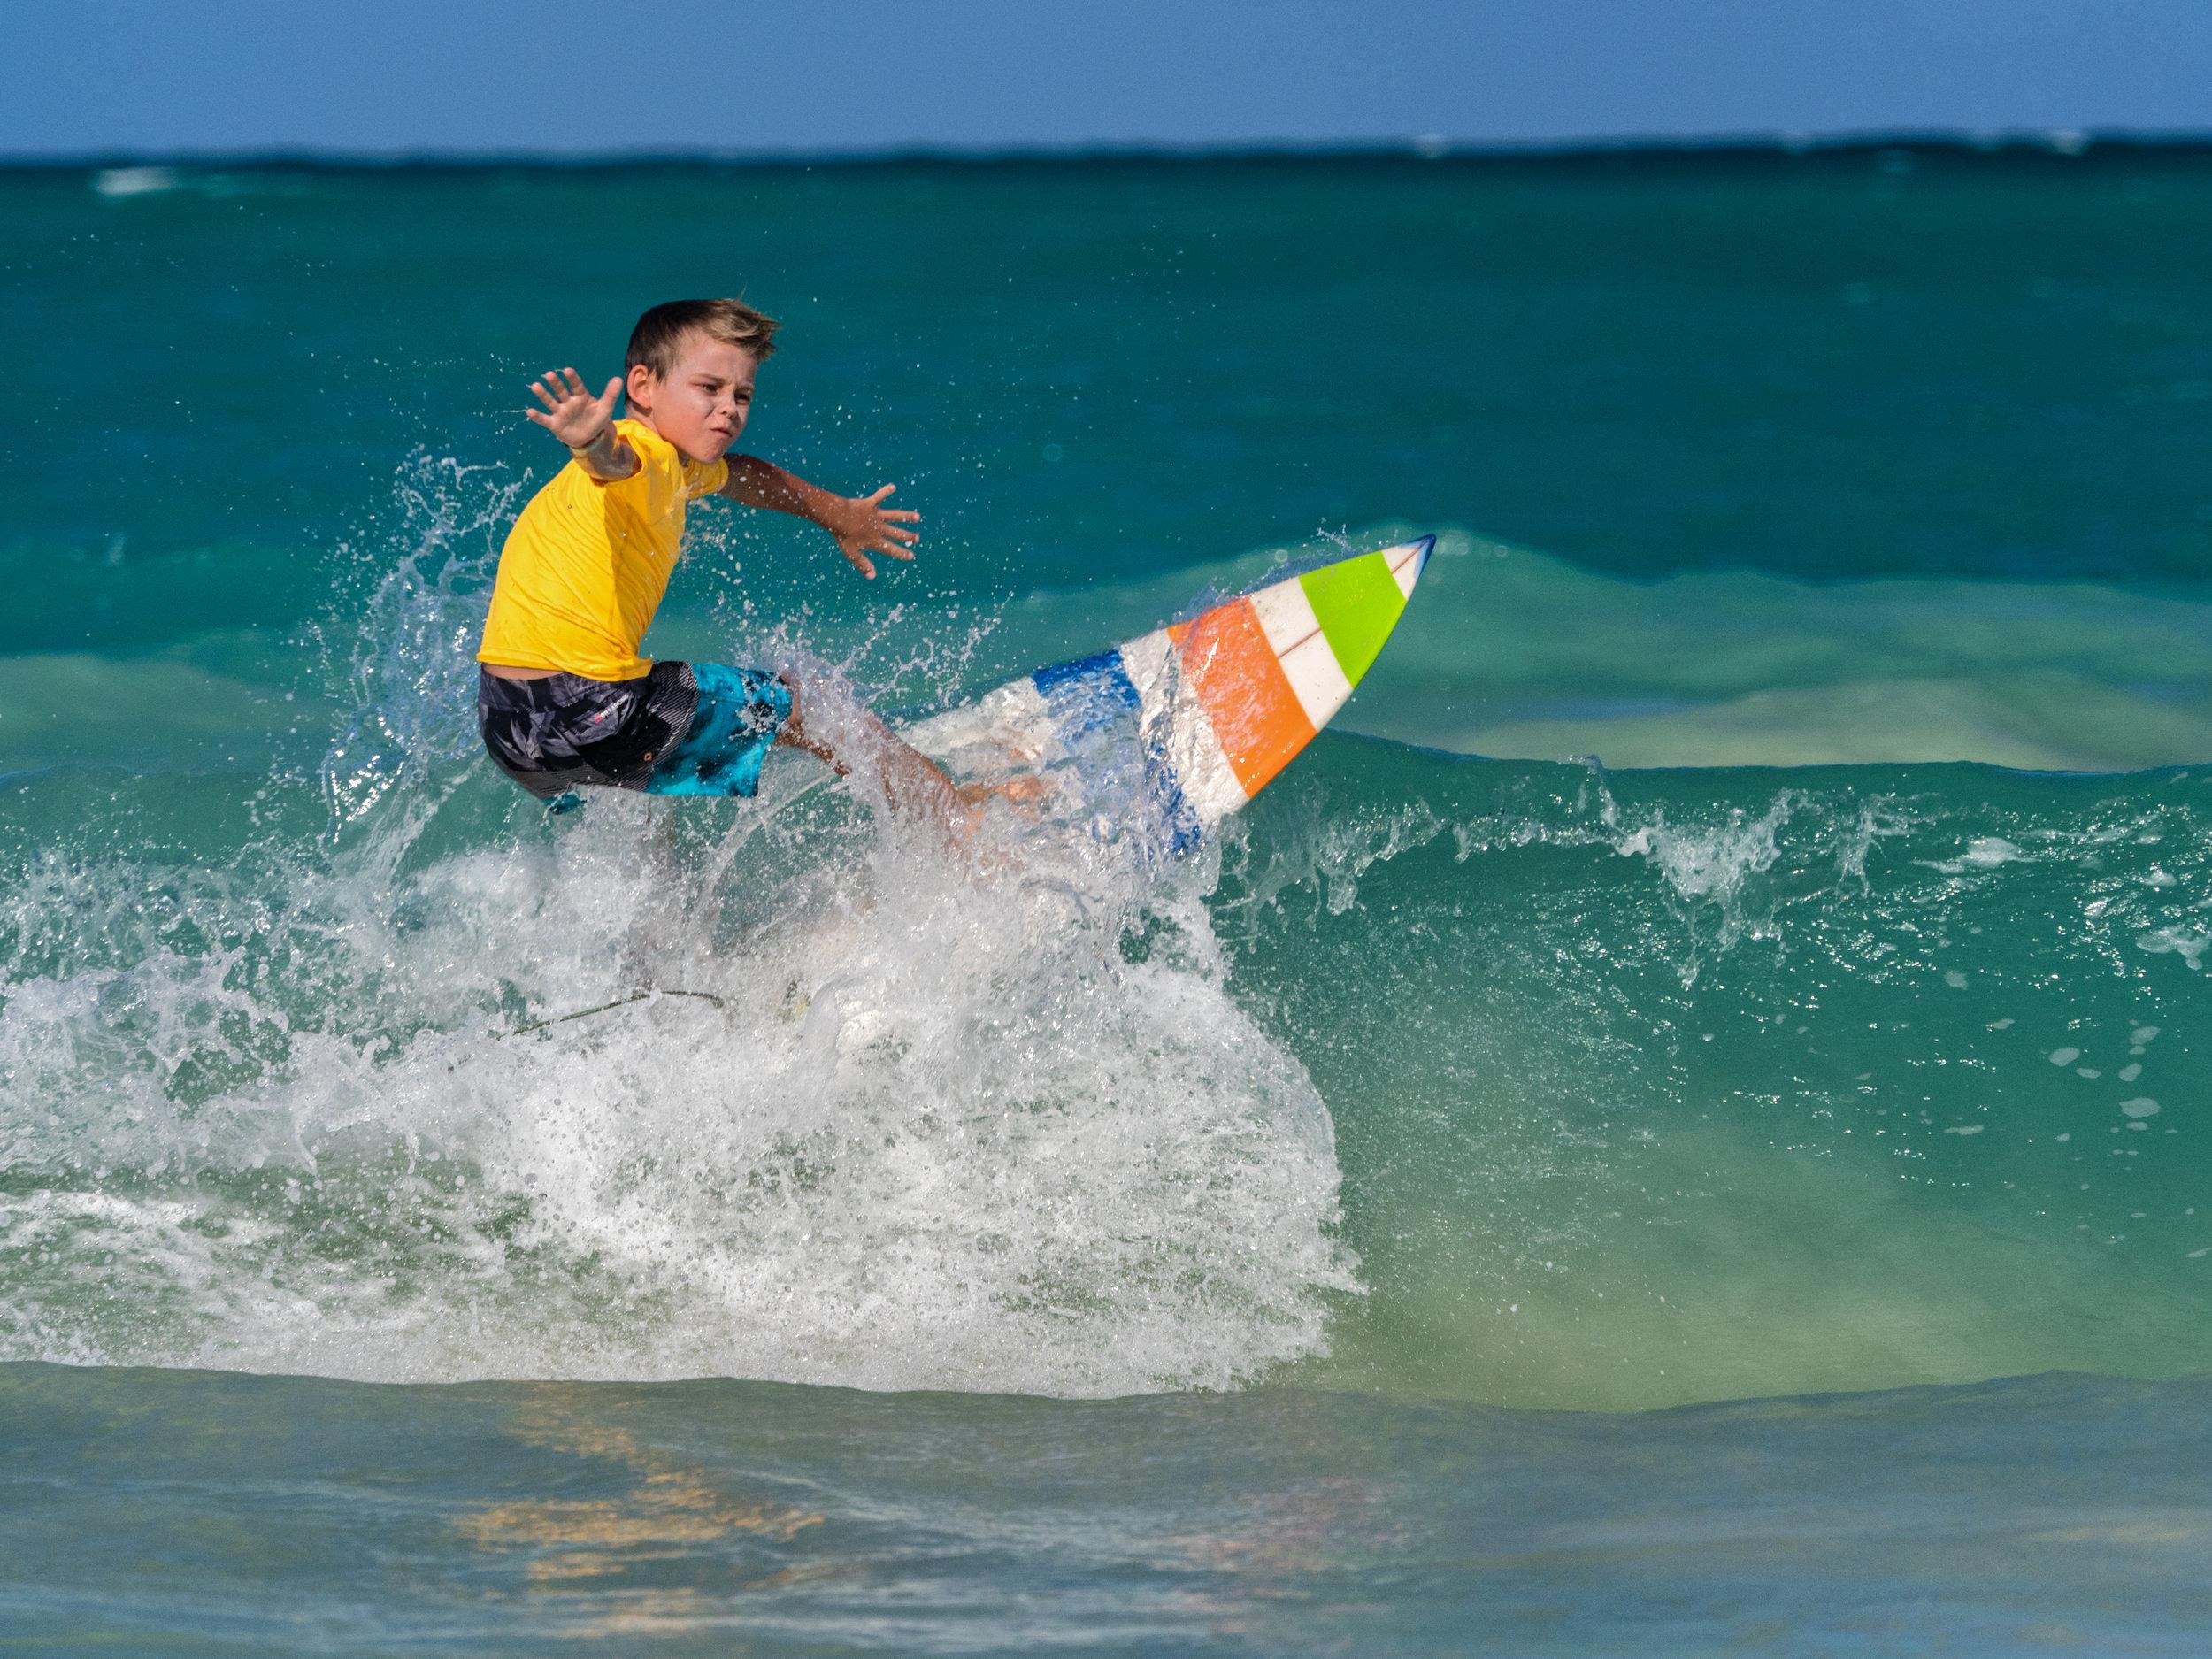 Kid Surfer at Kailua Oahu Hawaii - Seth T. Buckley